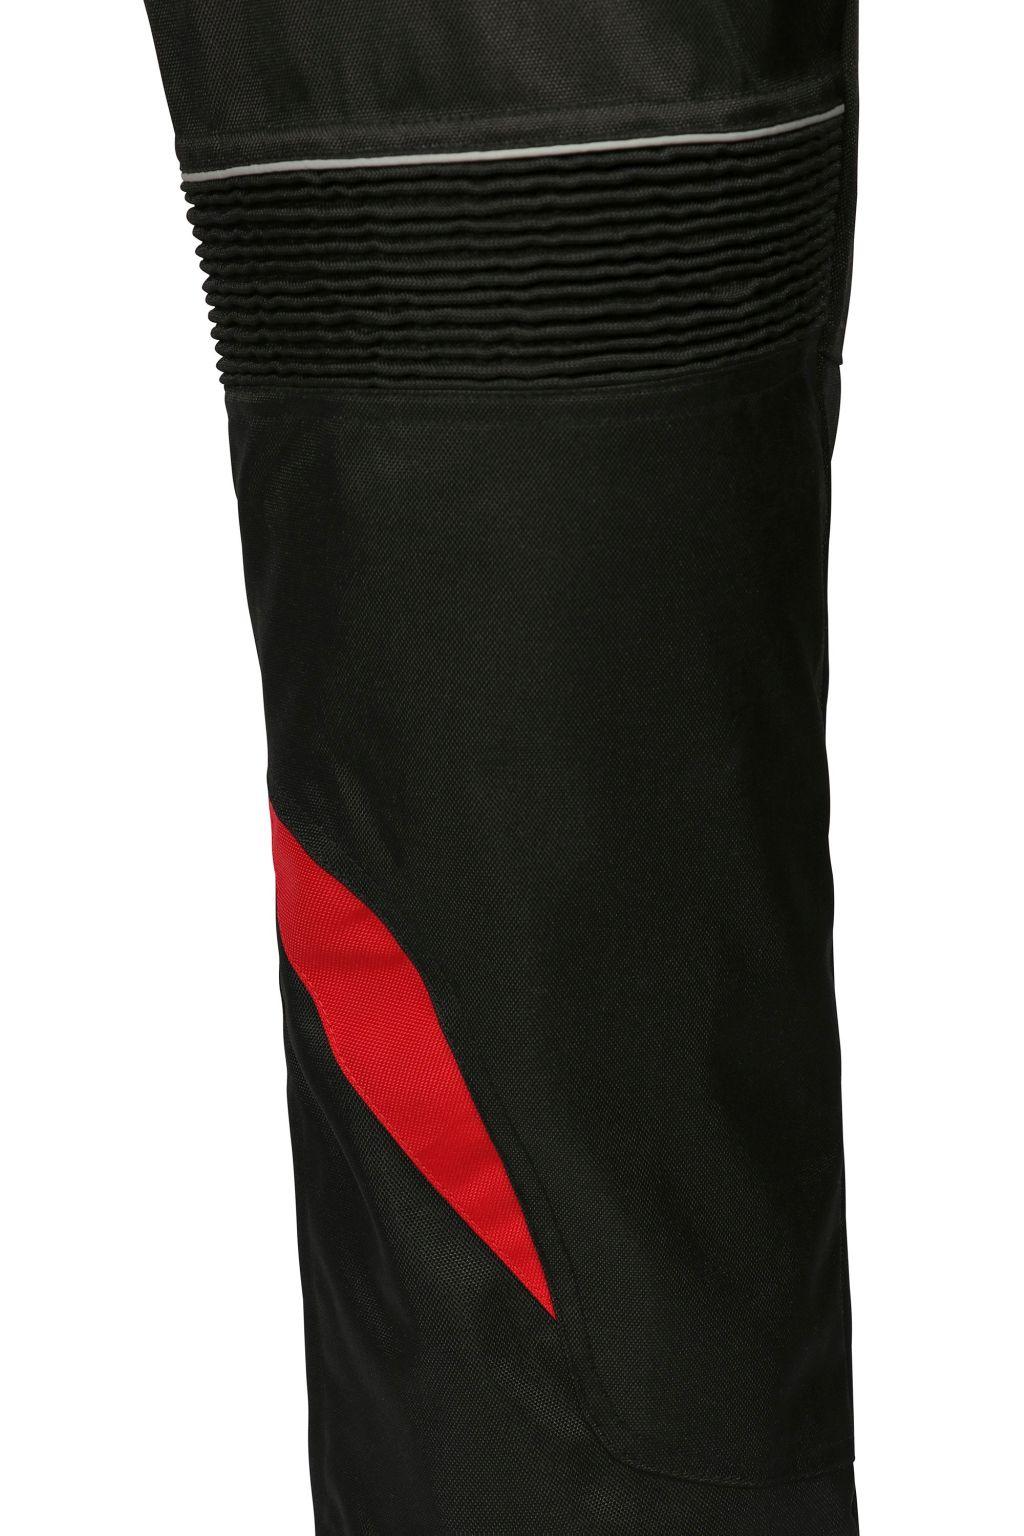 Bangla Damen Motorradhose Textil Hose Schwarz Rot S M L XL XXL XXXL